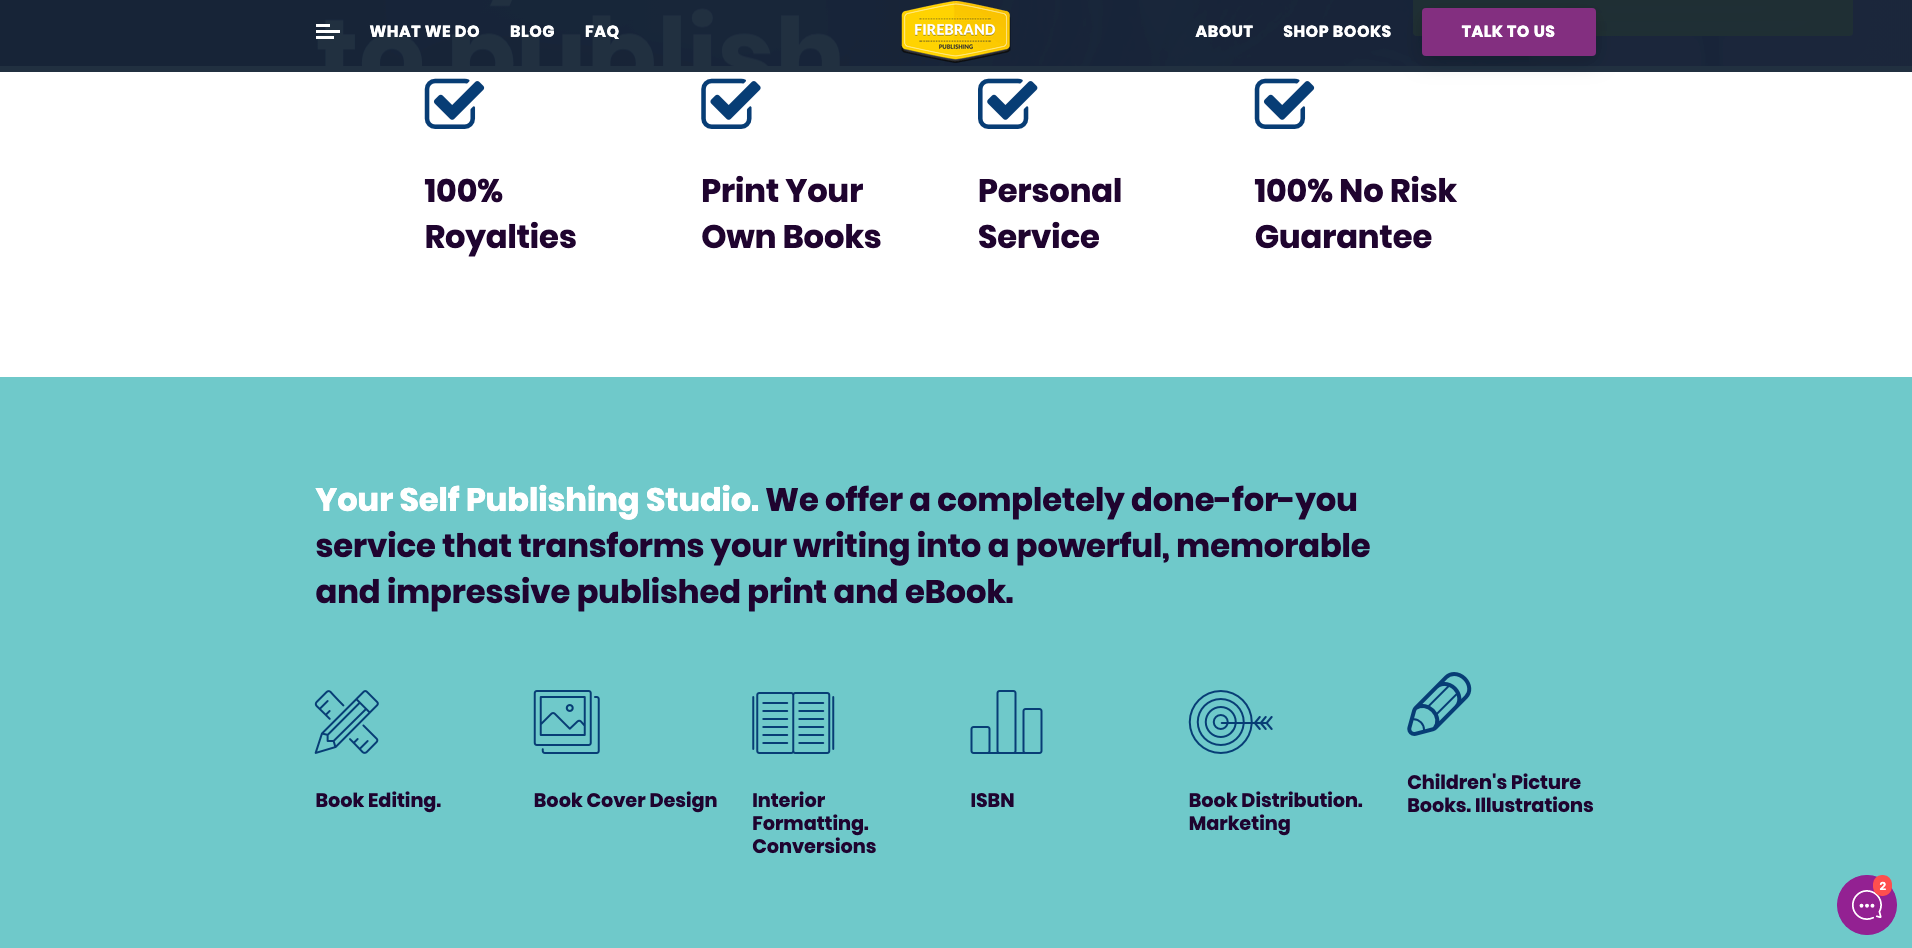 Website Design Digital Marketing For Publishing Company